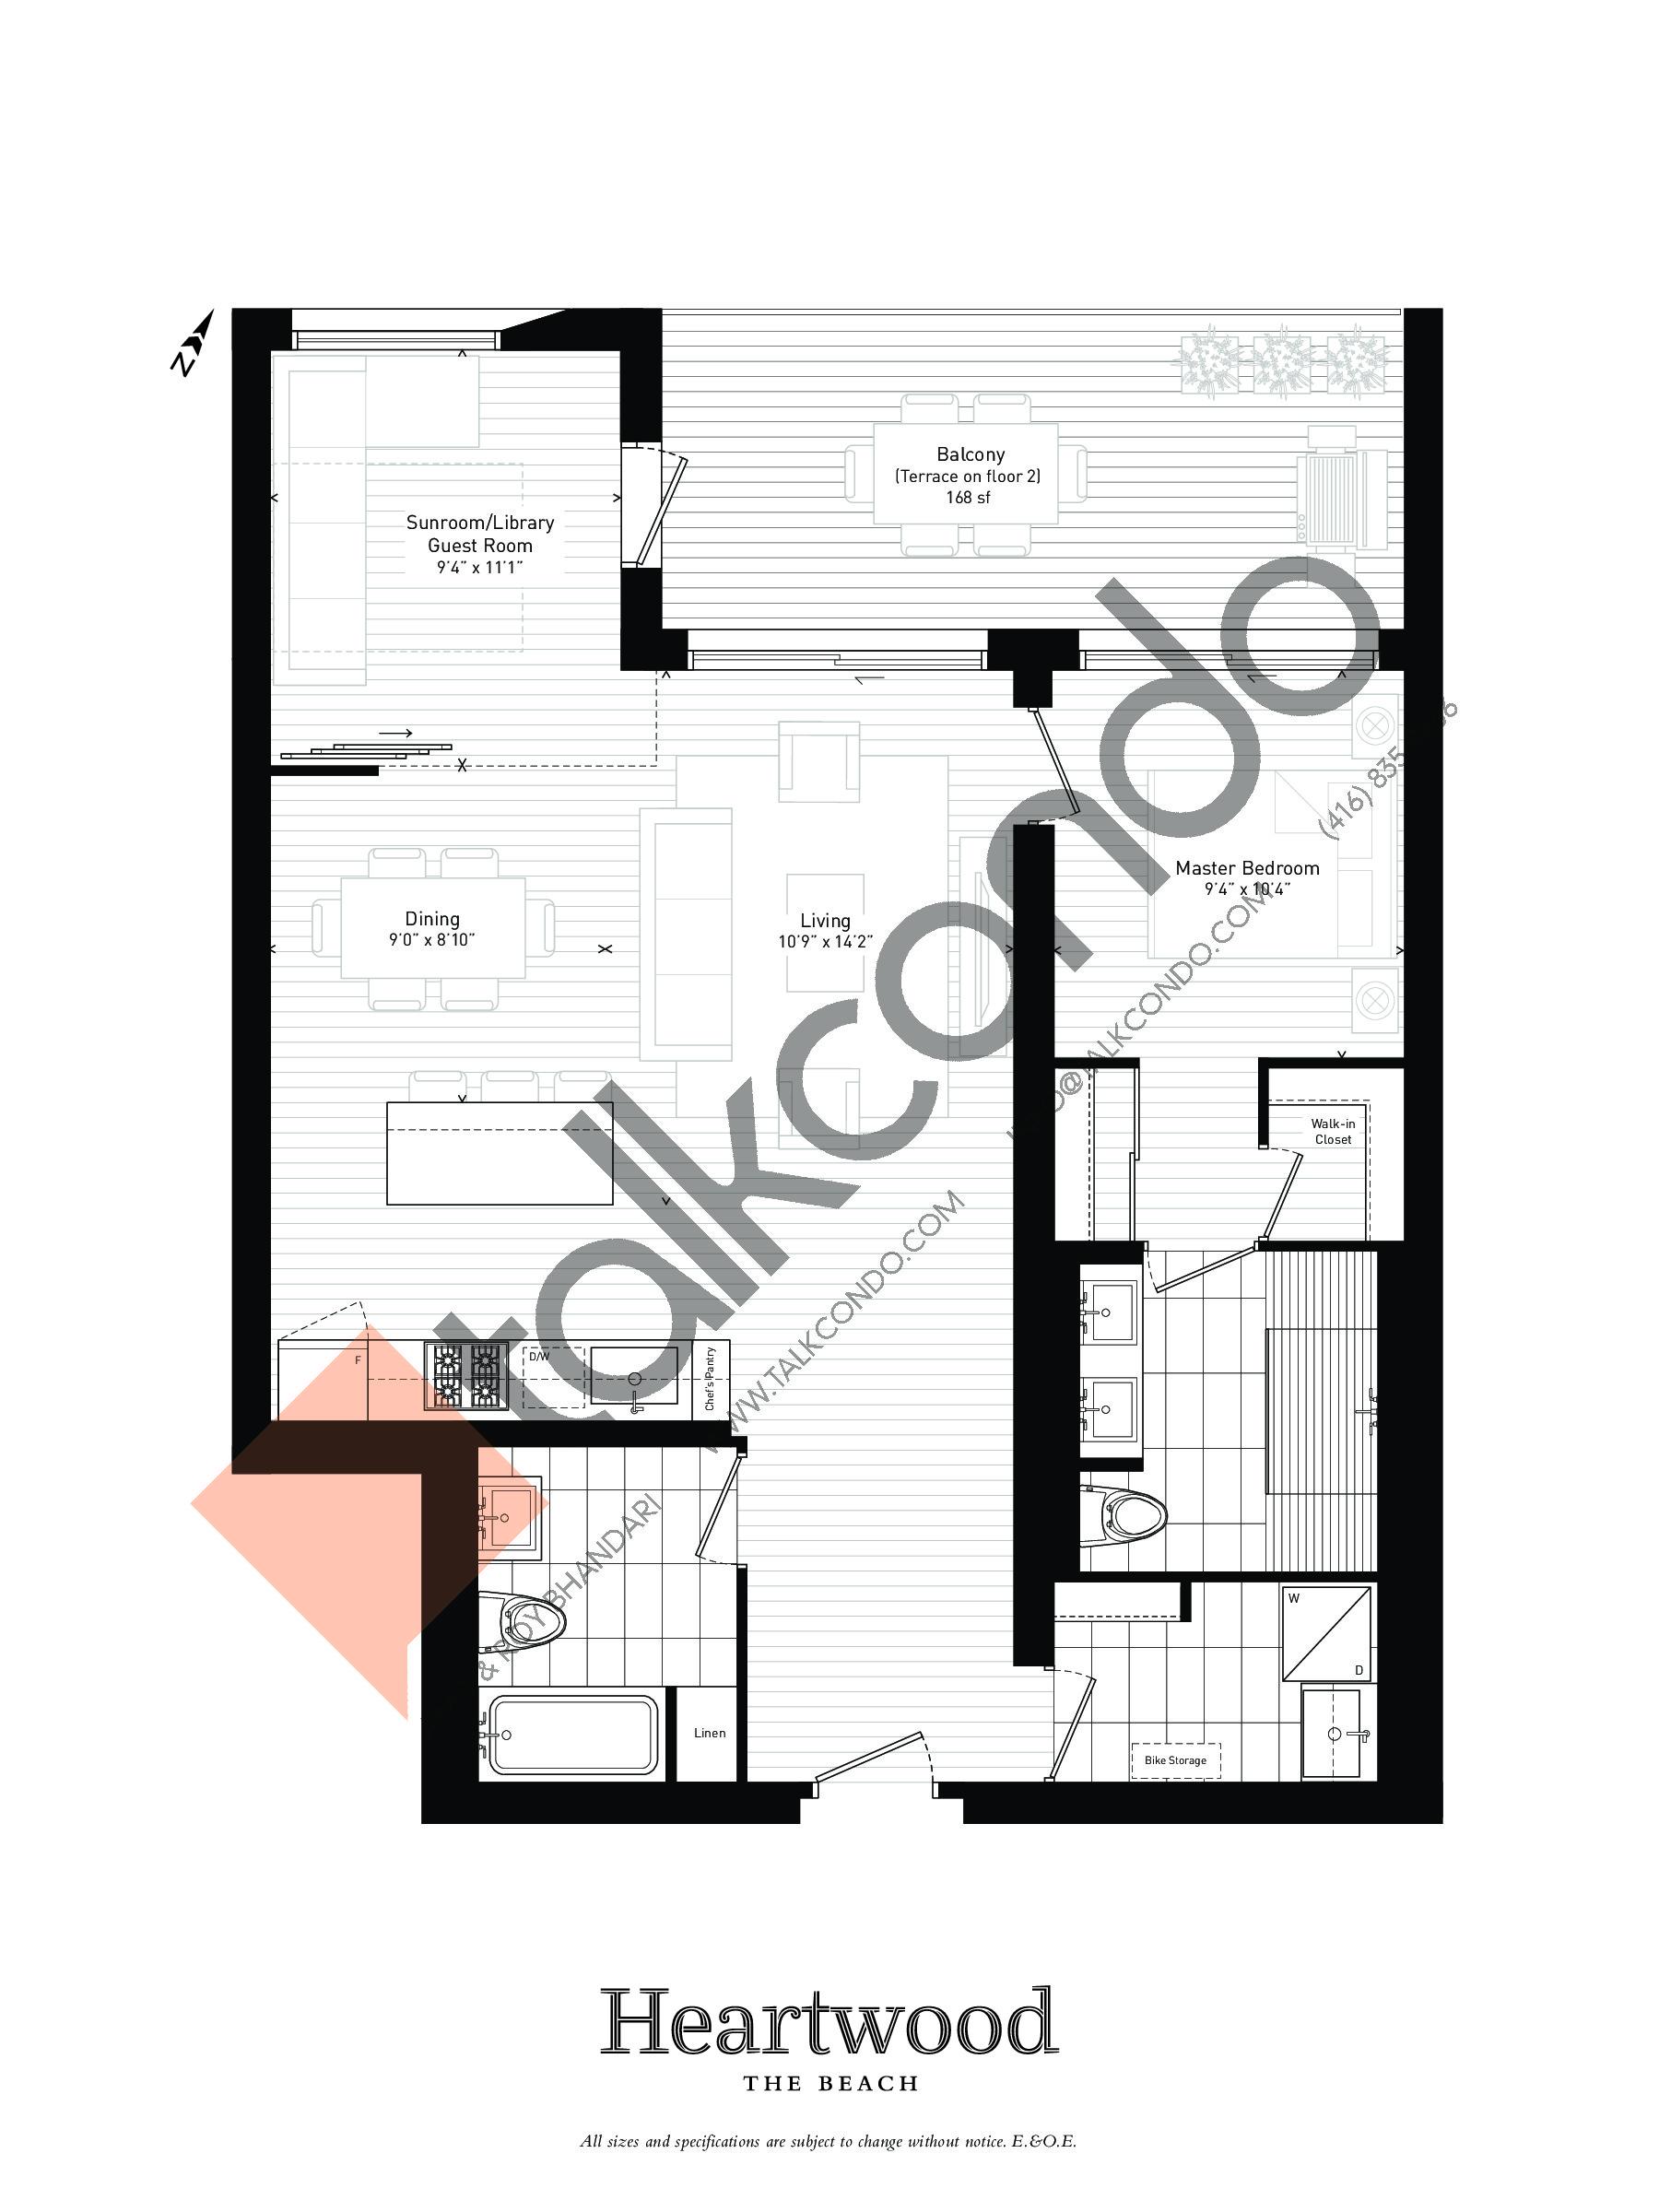 06 Floor Plan at Heartwood the Beach Condos - 1064 sq.ft